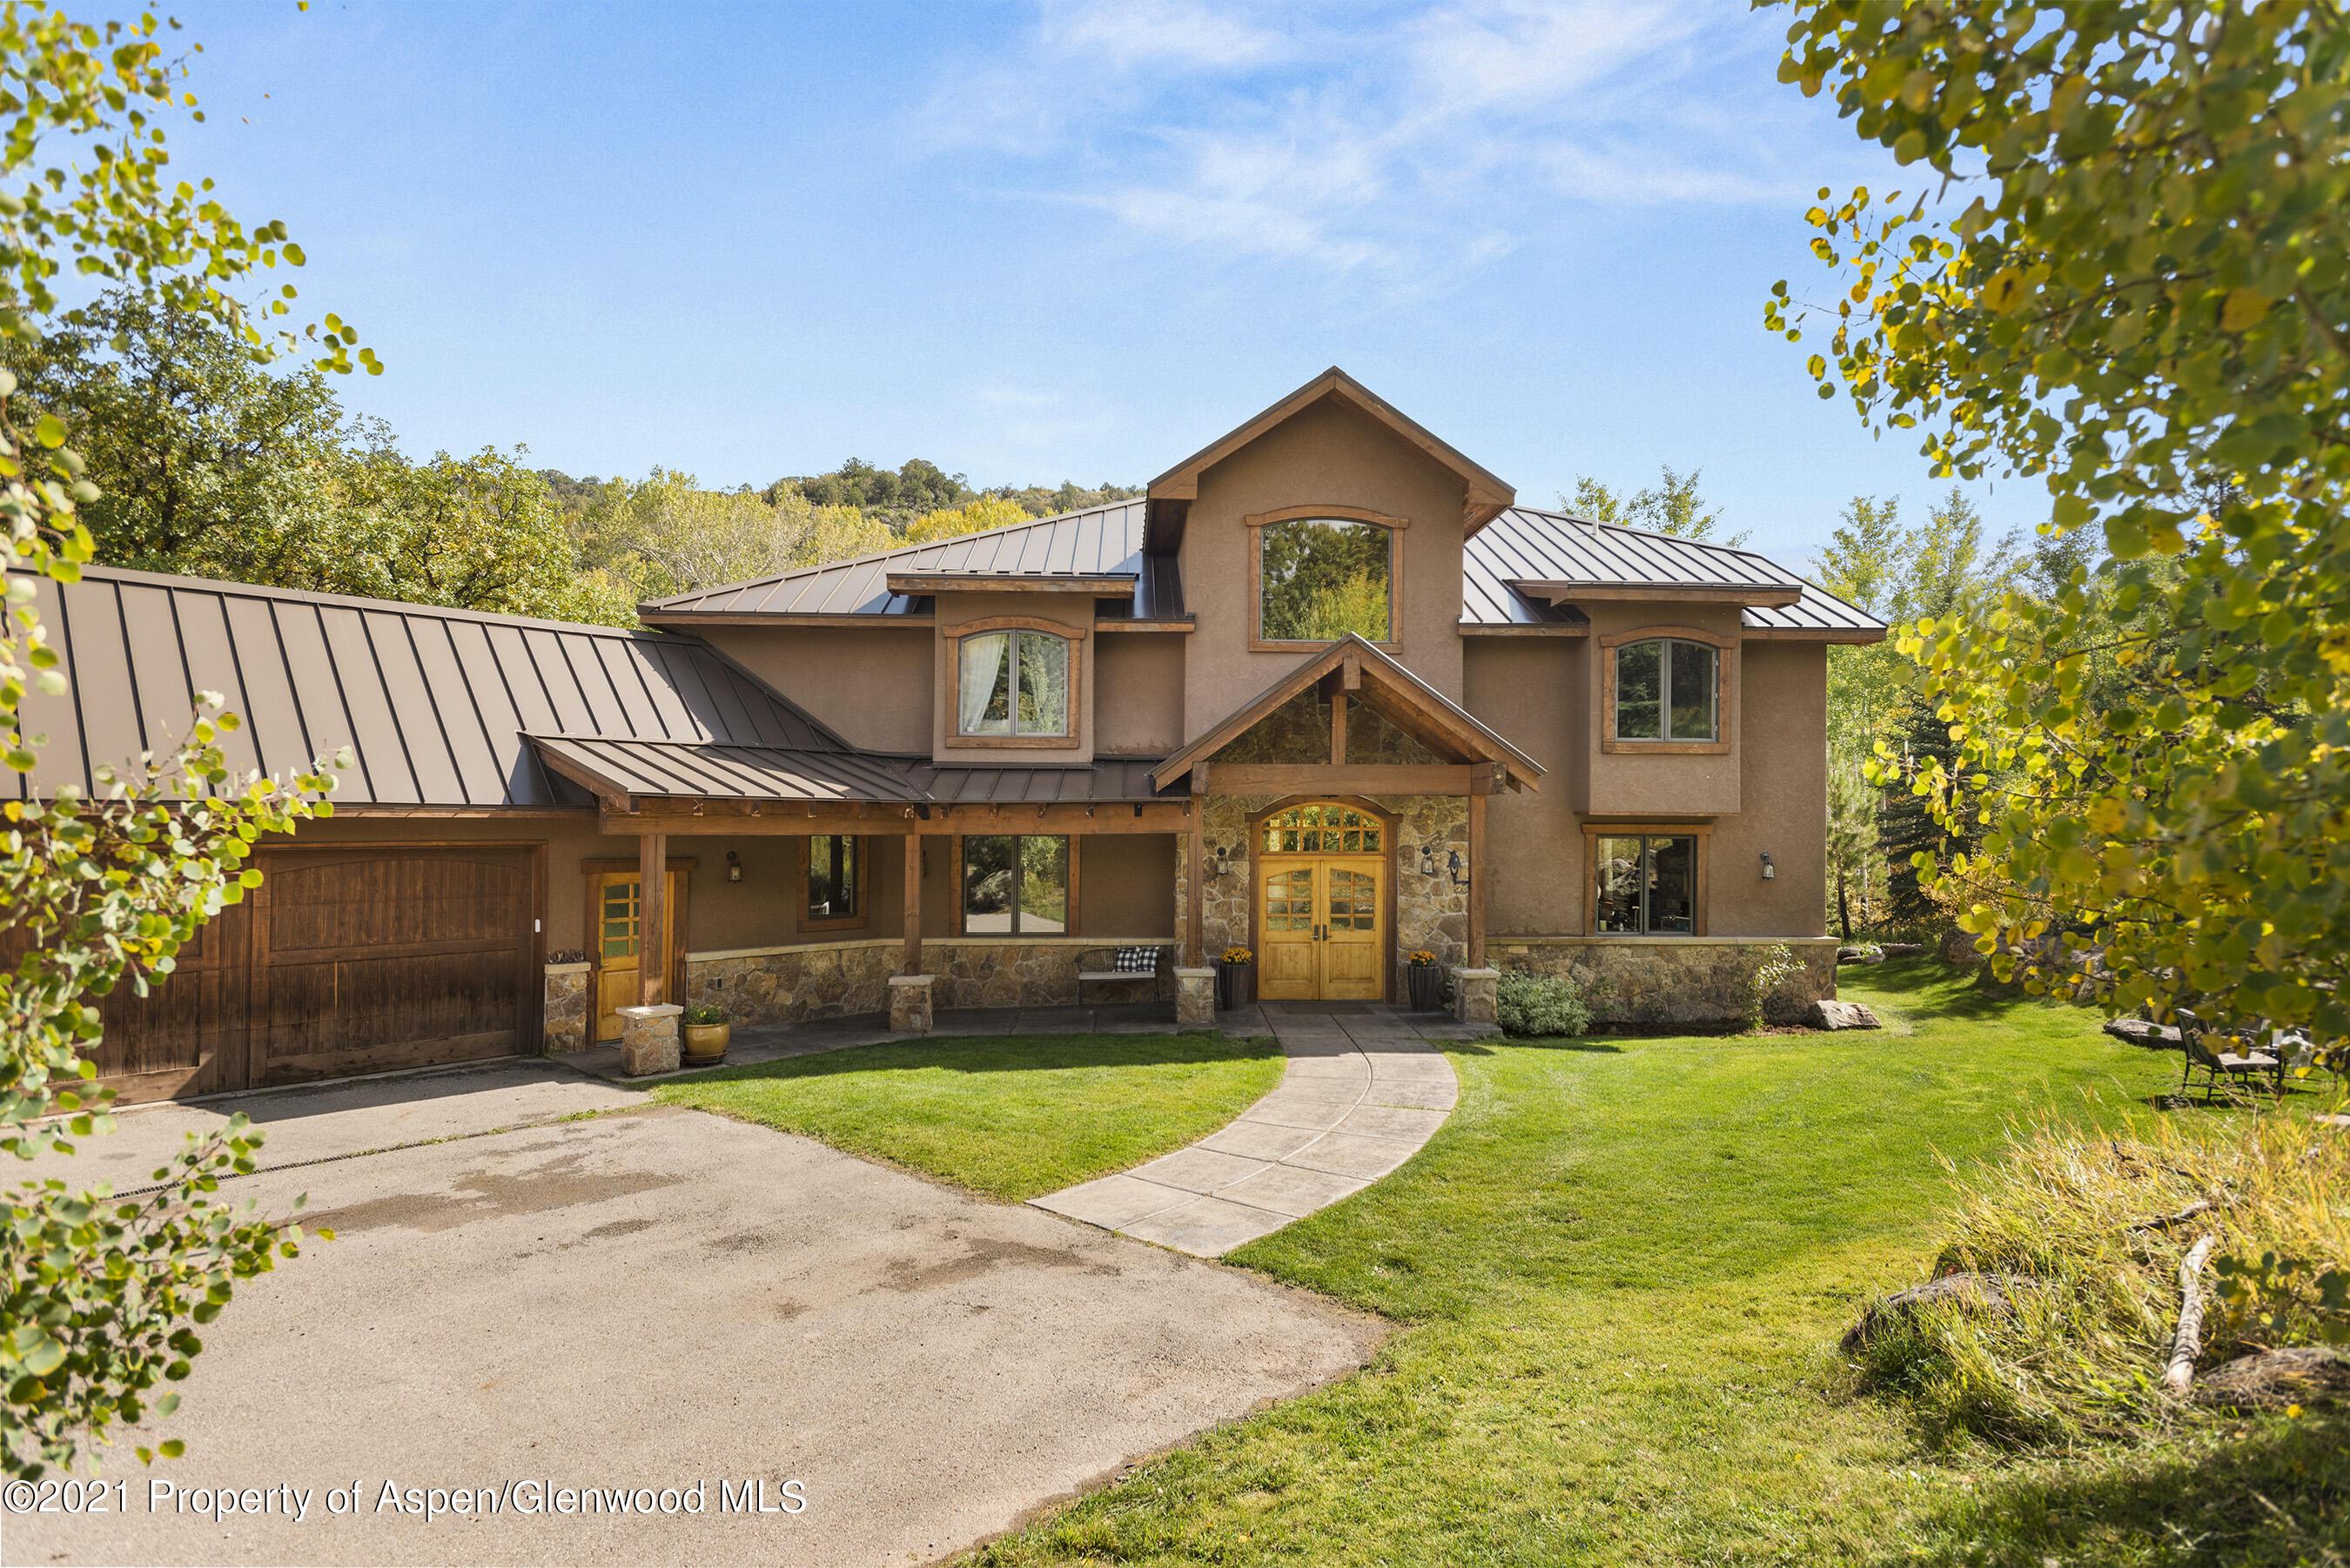 6445 County Road 117, Glenwood Springs, CO 81601